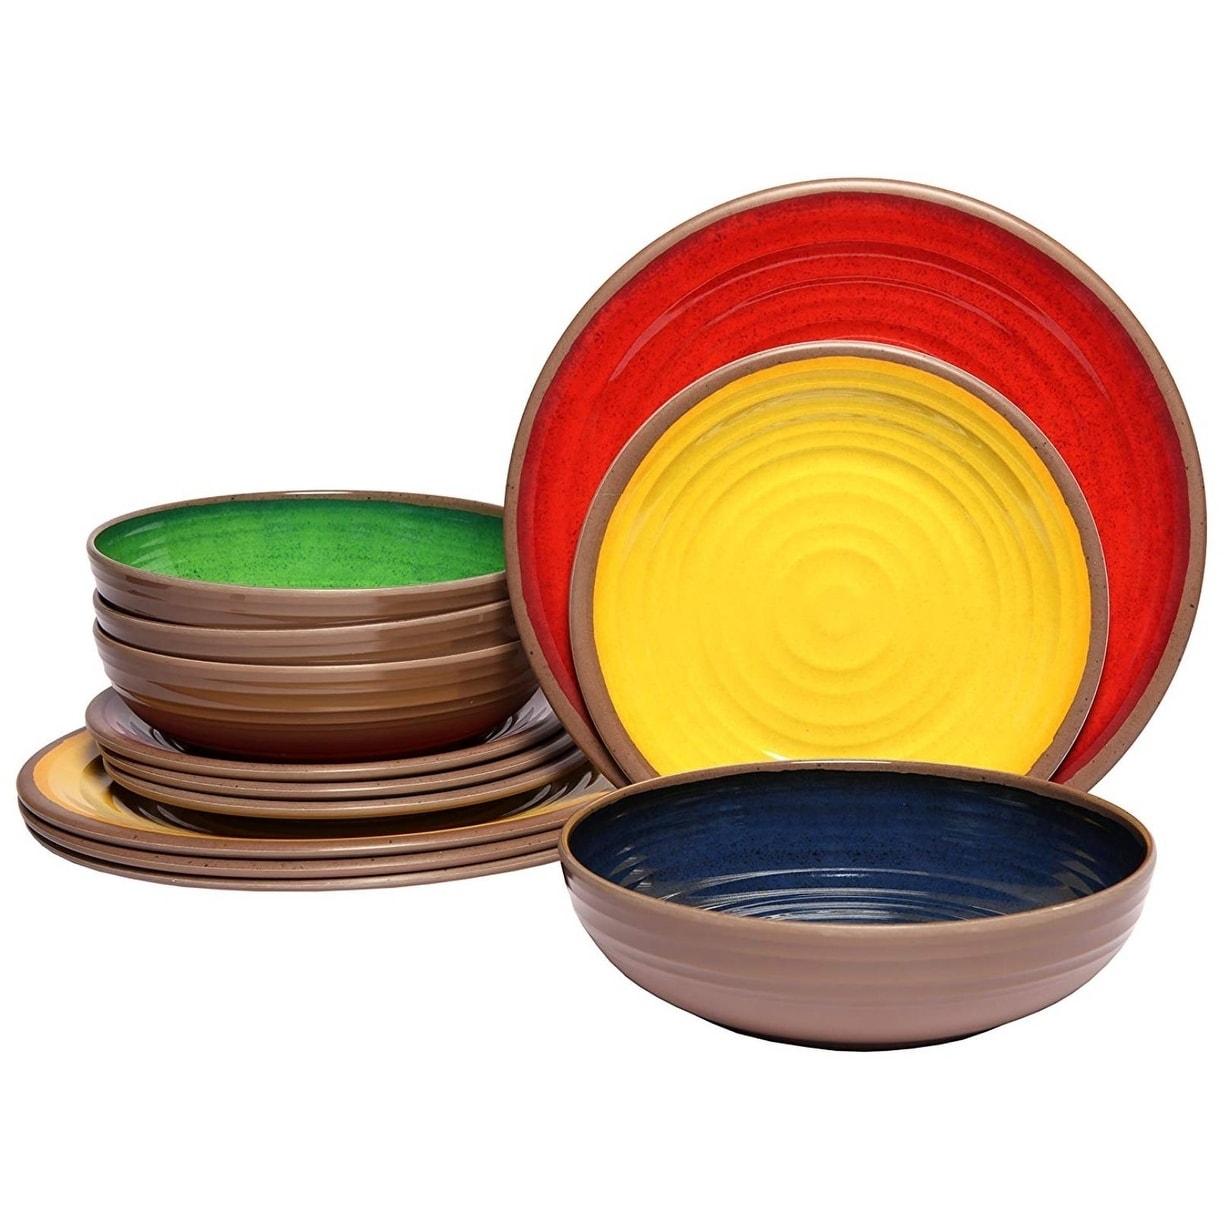 Melange 36 Piece 100 Dinnerware Set Clay Collection Color Multicolor Dinner Plate Salad Plate Soup Bowl 12 Each Melamine Dinnerware Sets Melamine Dinnerware Dinnerware Sets